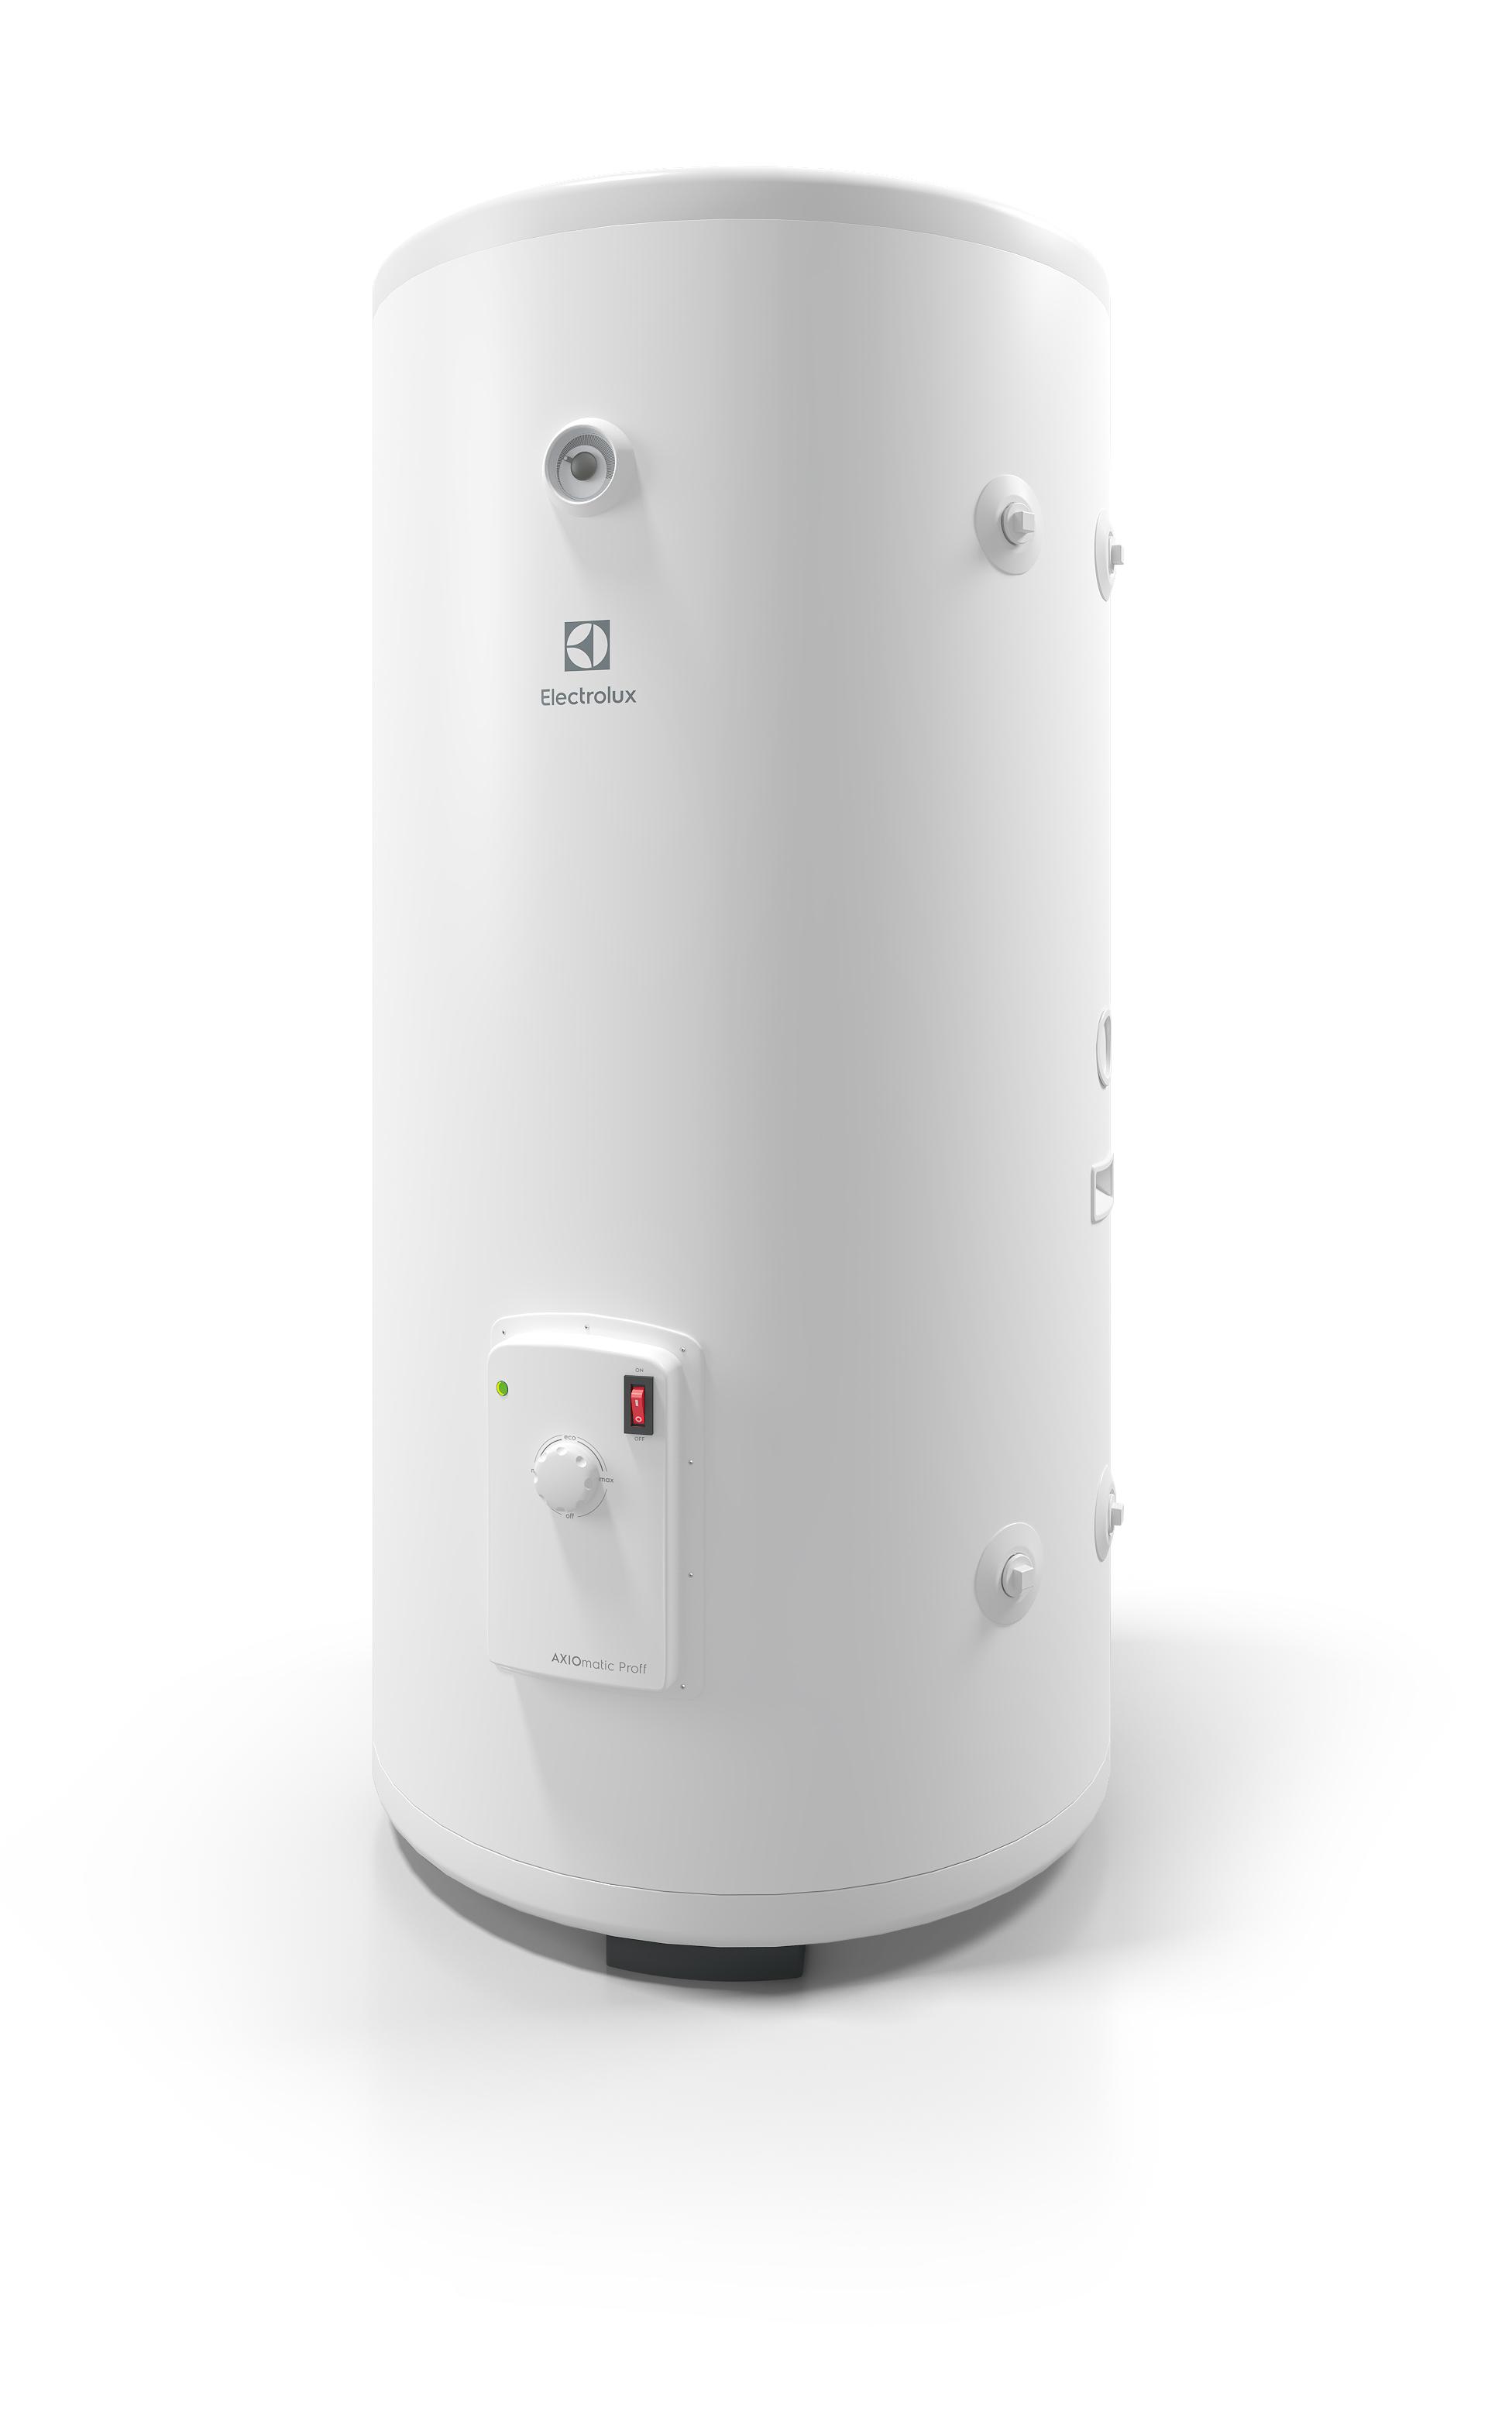 AXIOmaticProff от Electrolux: 200 литров тепла